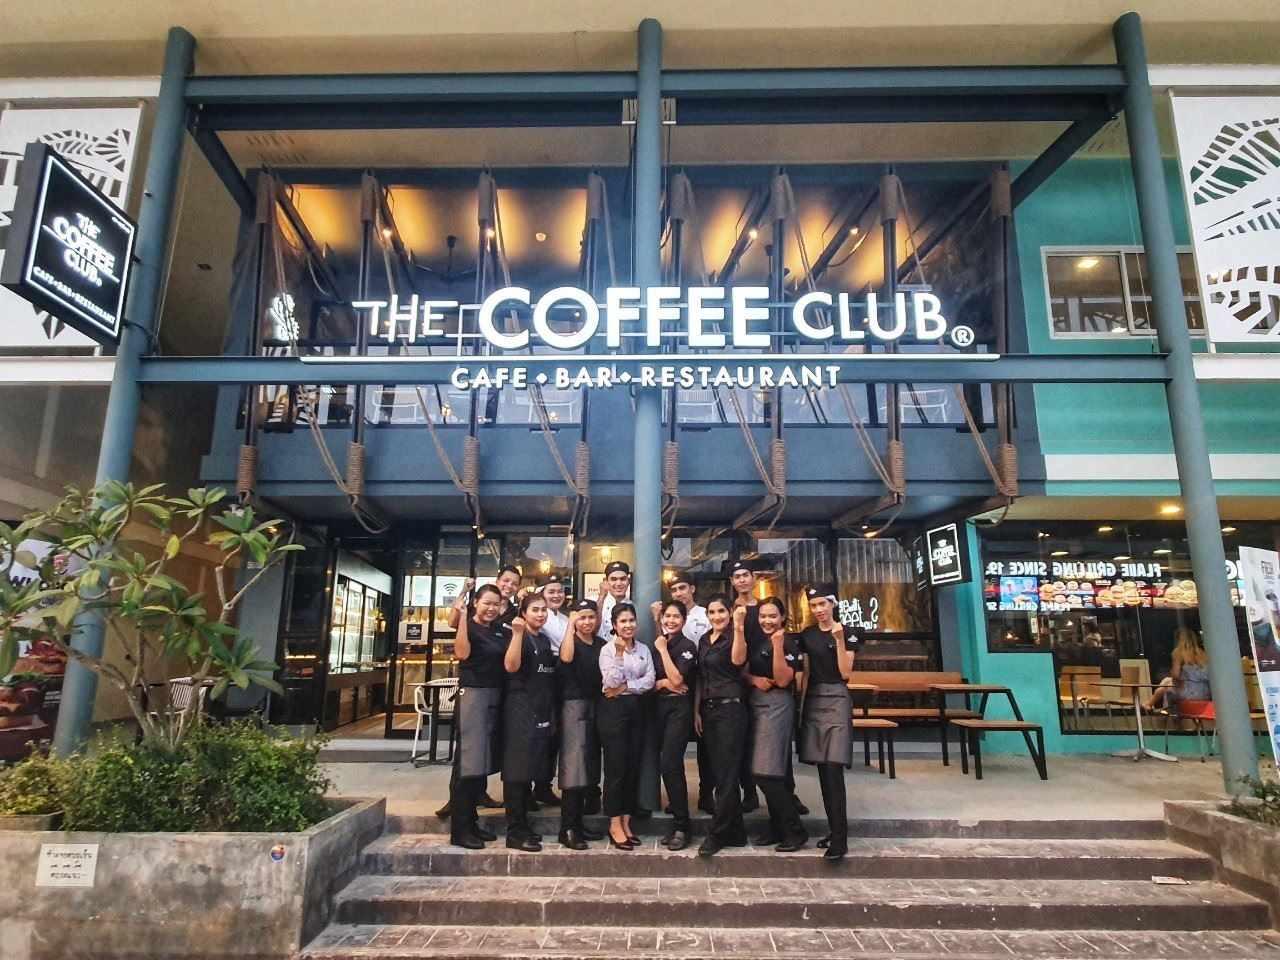 The Coffee Club Koh Phi Phi team on the doorstep